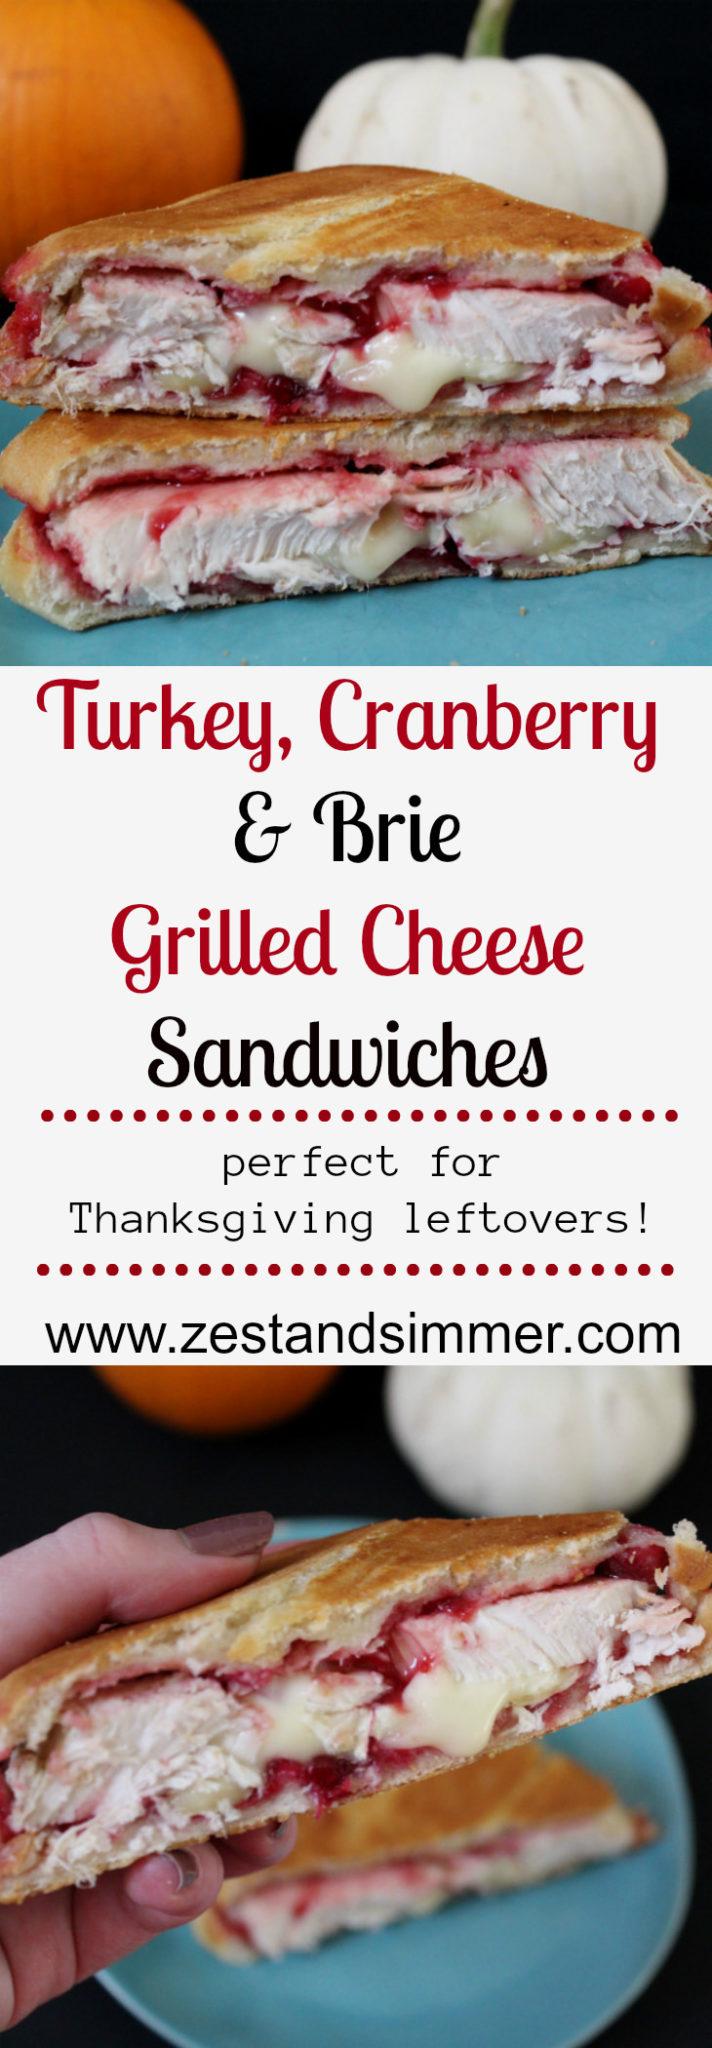 Turkey, Cranberry & Brie Grilled Cheese Sandwich Pinterest Image